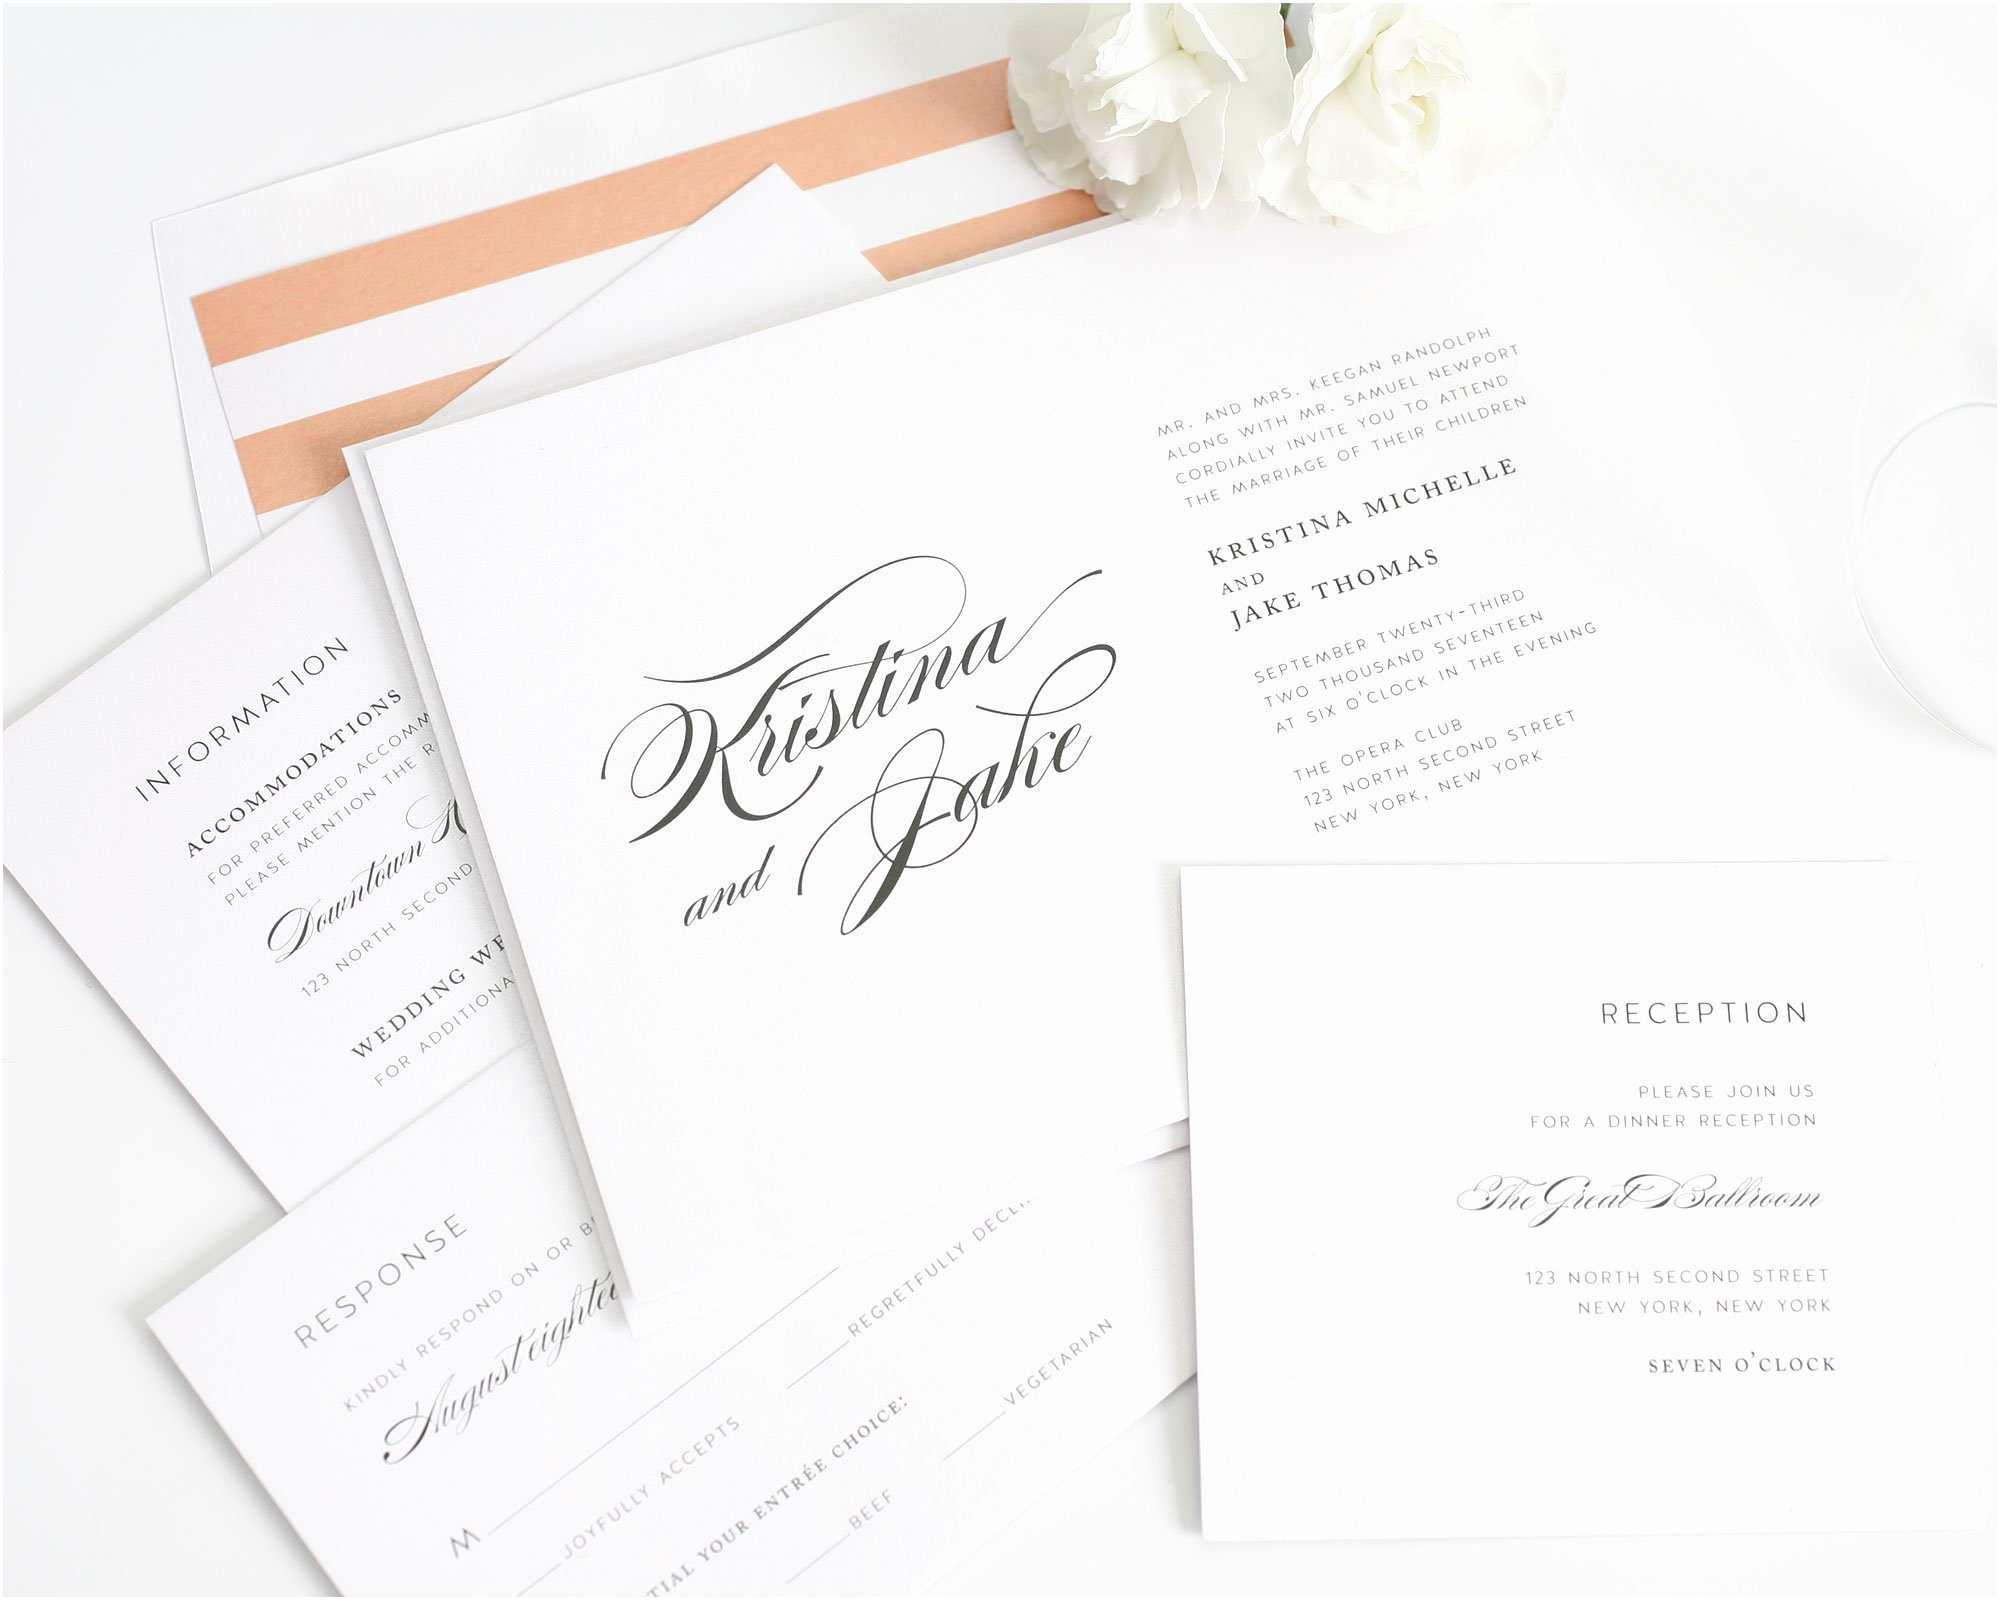 Truly Romantic Wedding Invitations Romantic Elegant Wedding Invitations – Wedding Invitations